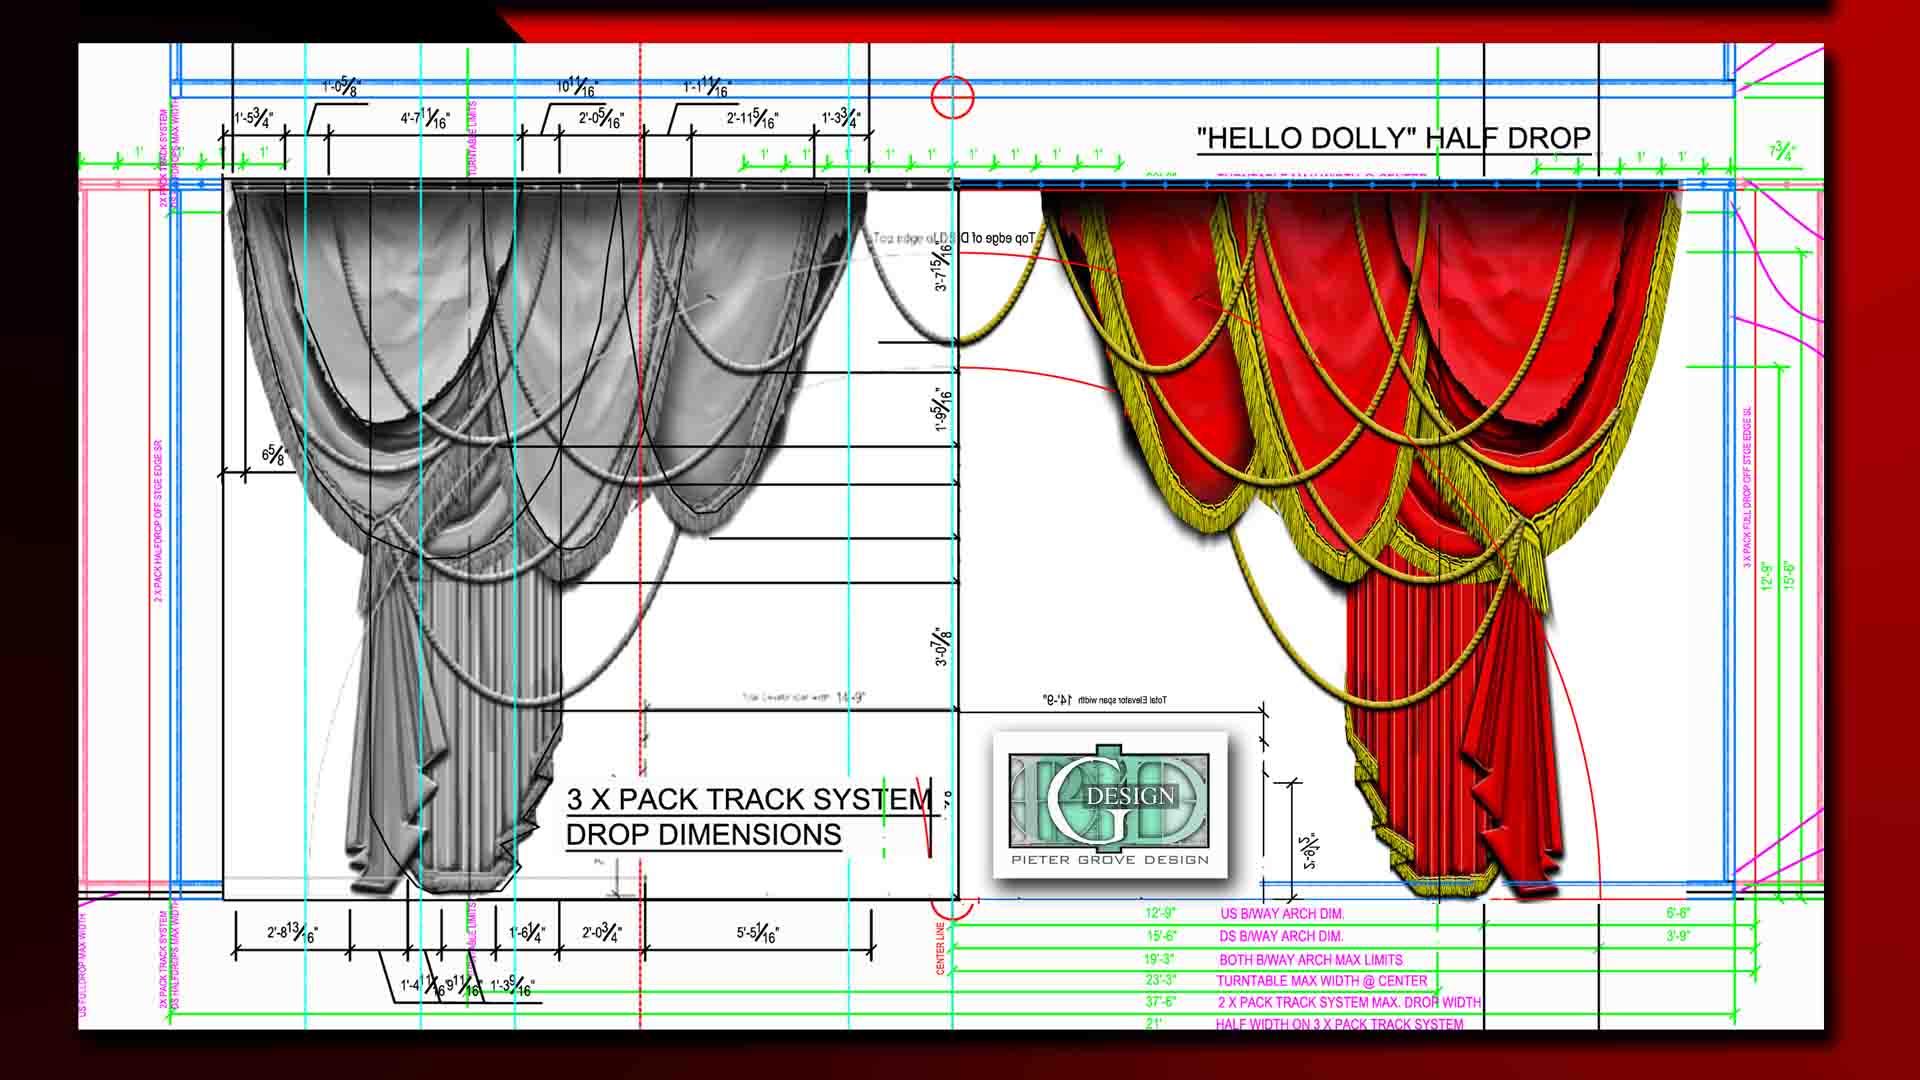 Set Designer-Pieter Grove